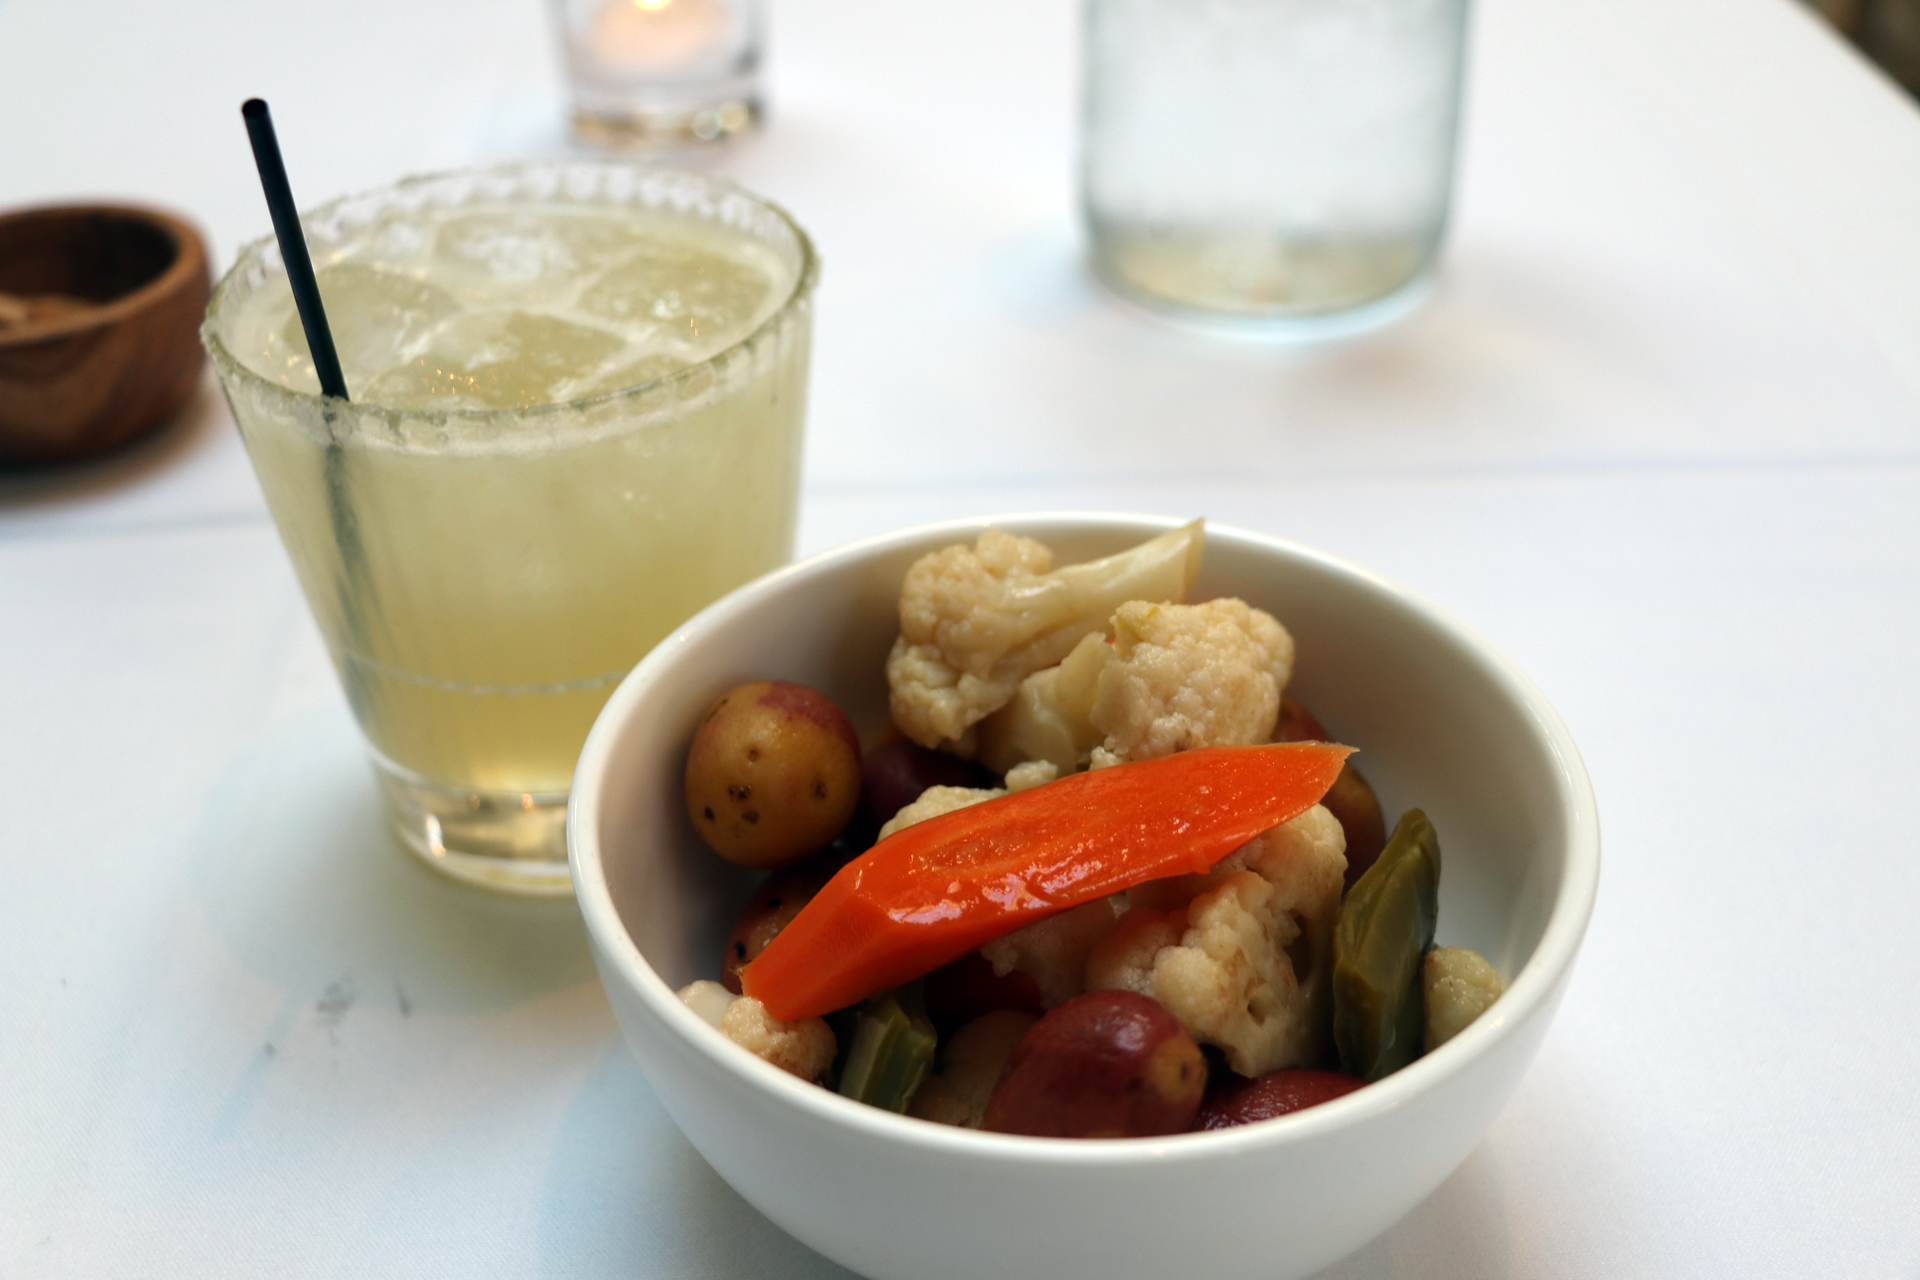 Mezcal margarita and vegetable escabeche.